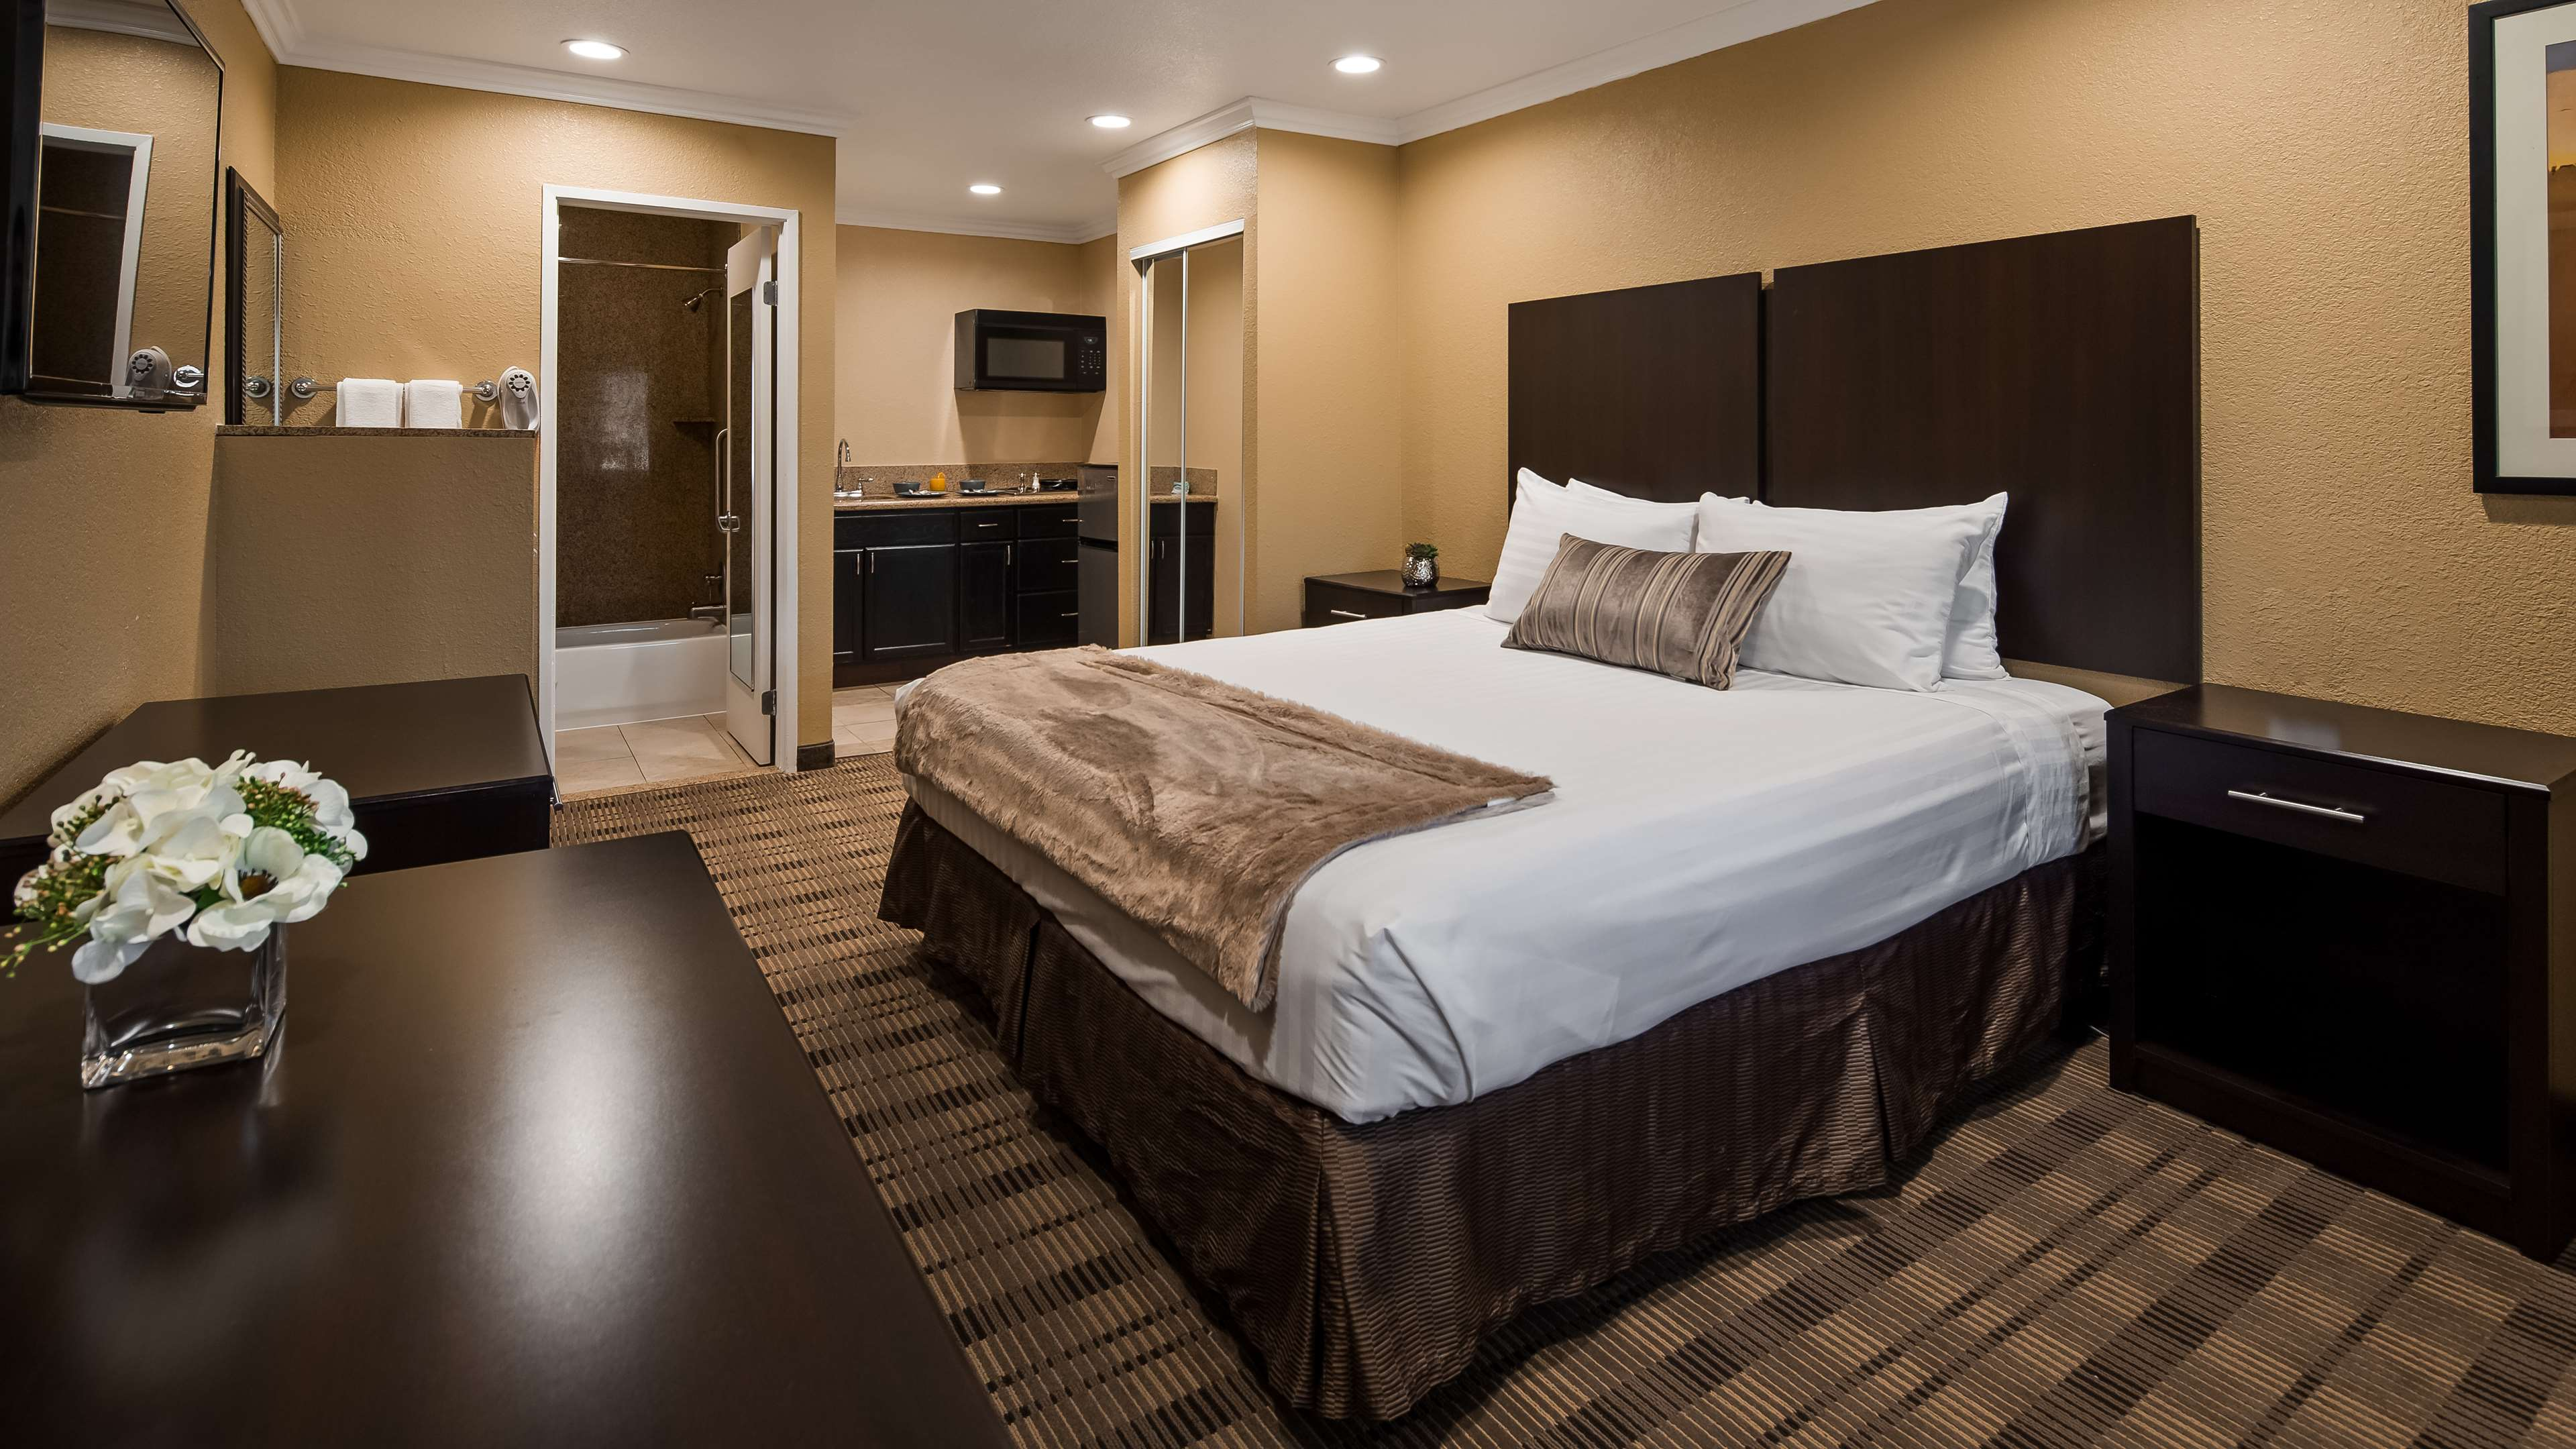 Best Western Poway/San Diego Hotel image 9